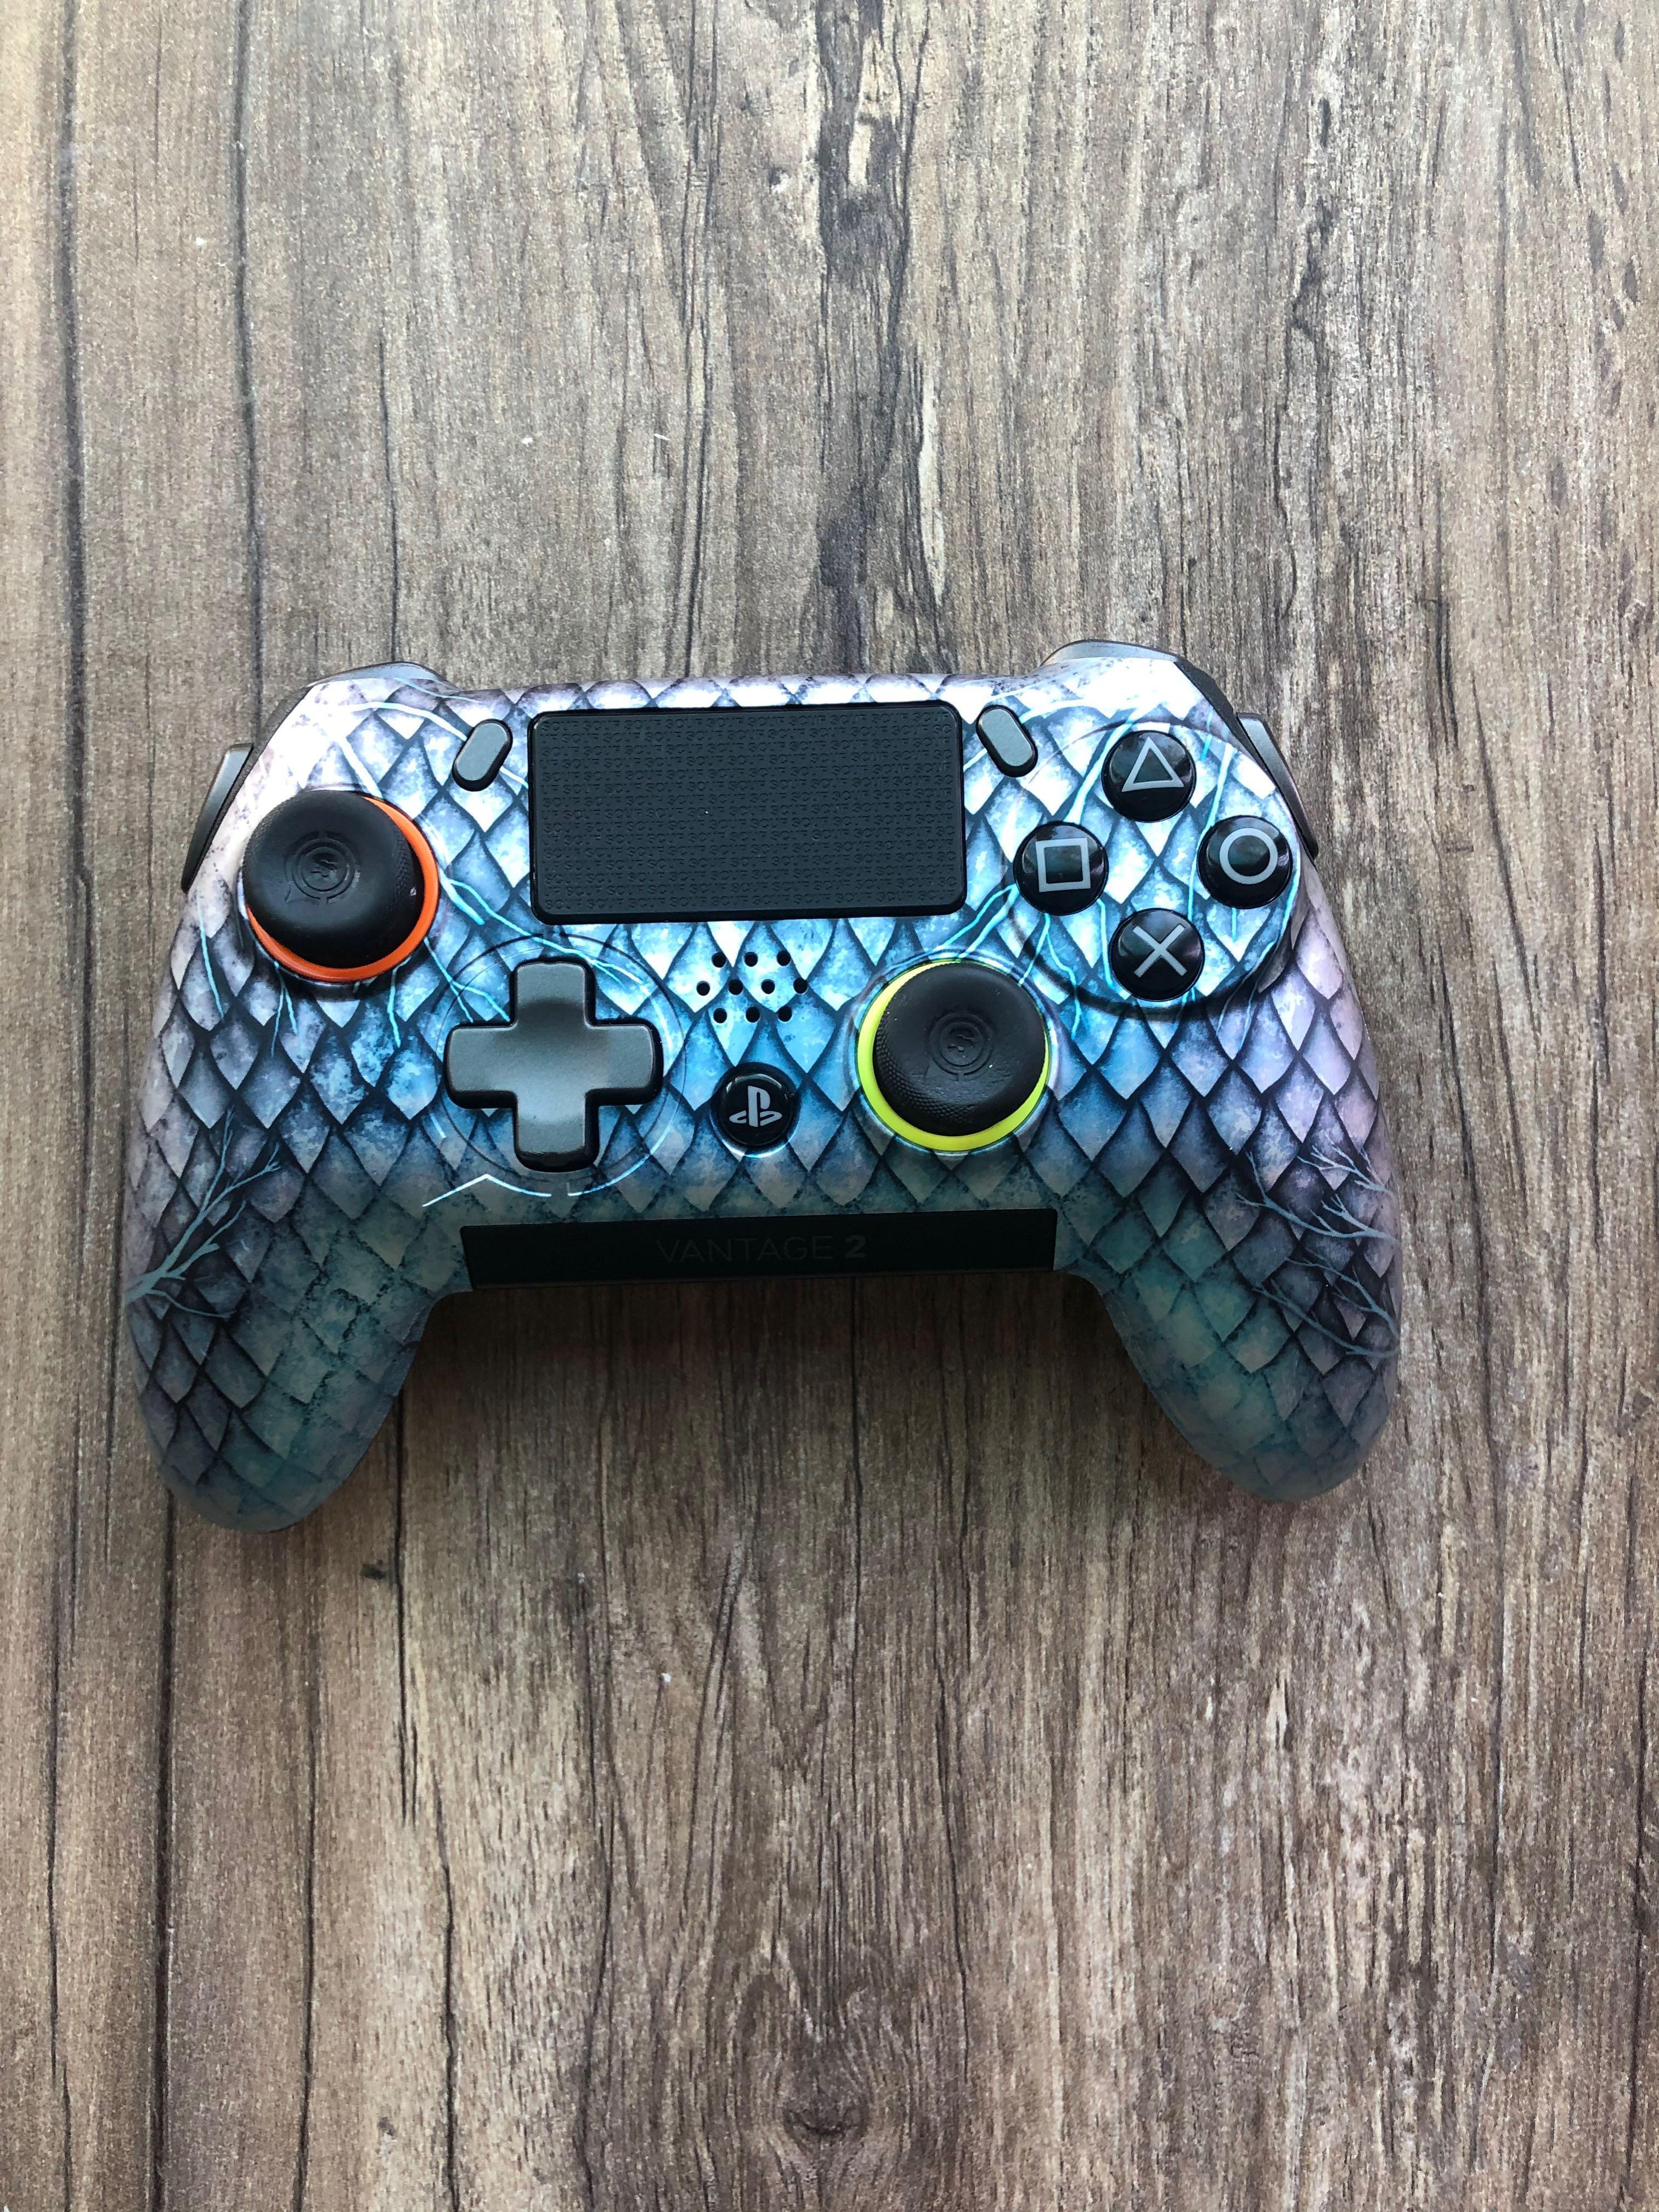 Scuf Vantage 2 Blue Dragon-PS4 controller